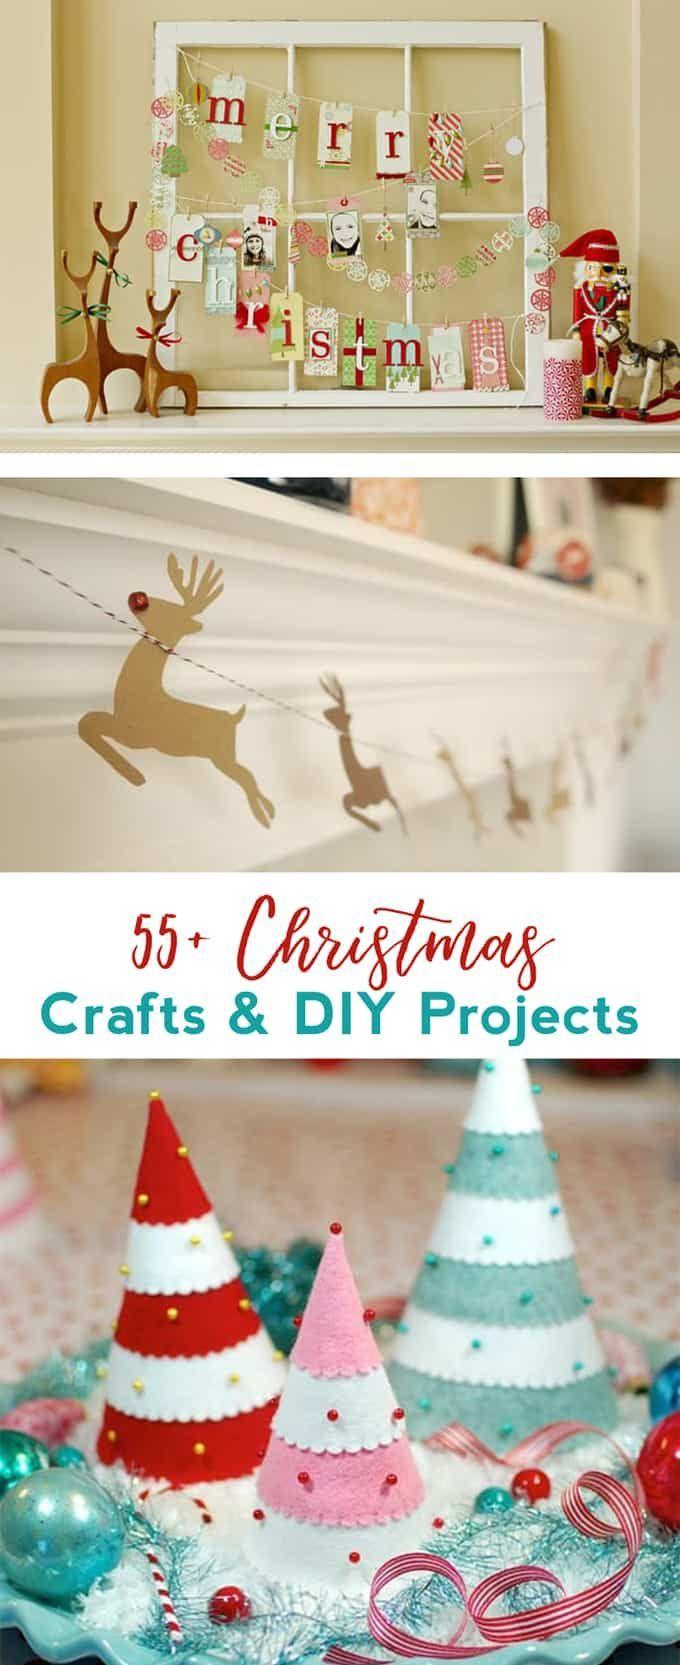 55+ Favorite Christmas Crafts & DIY Tutorials | Collective Crafts ...